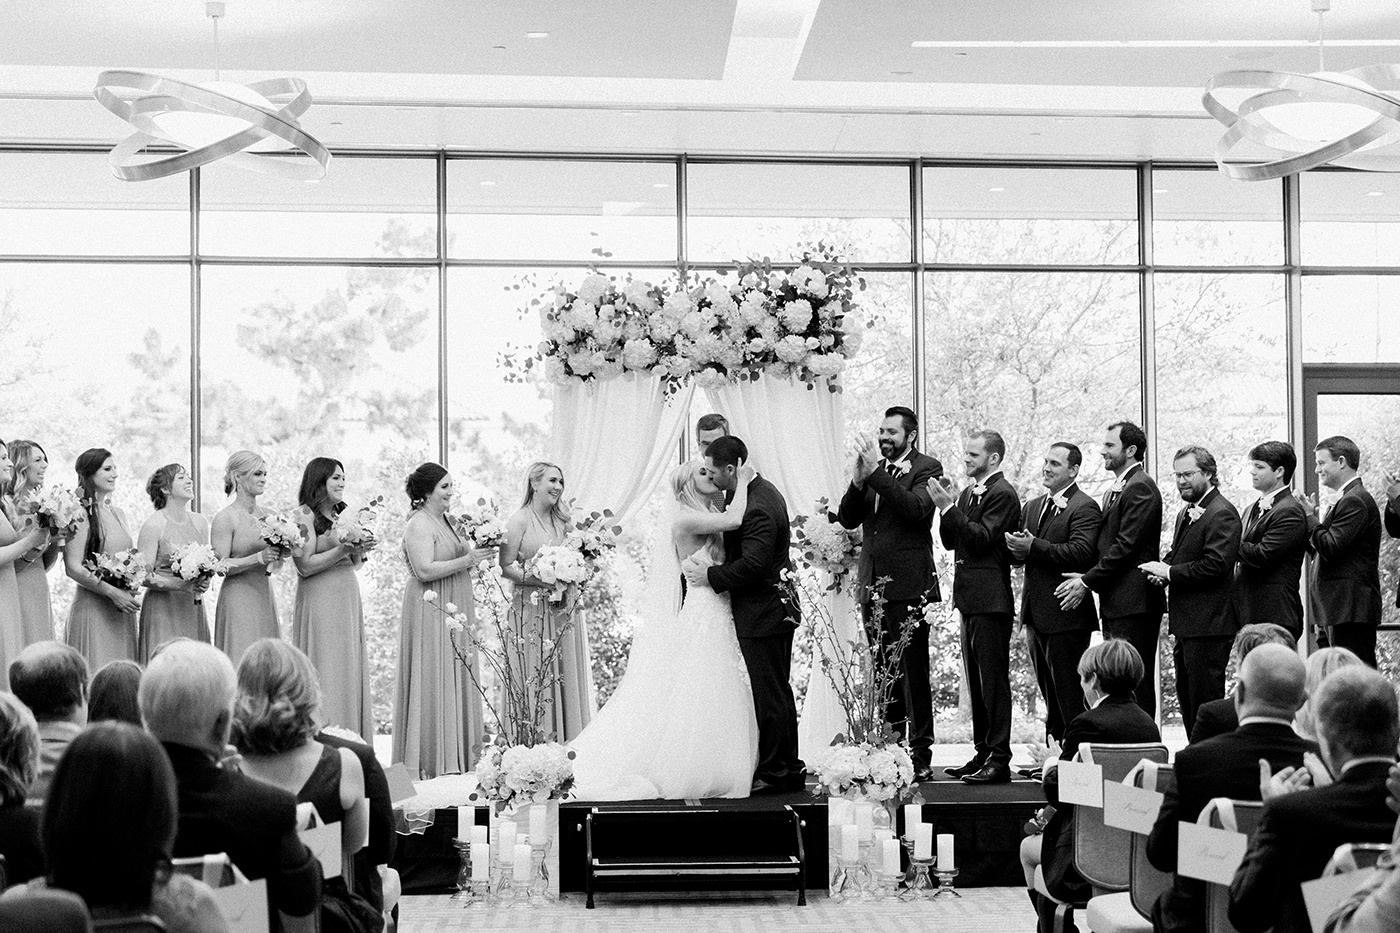 DFW Wedding Planner - Caroline + Jeff at The Four Seasons Hotel Wedding - Allday Events - 107.jpg